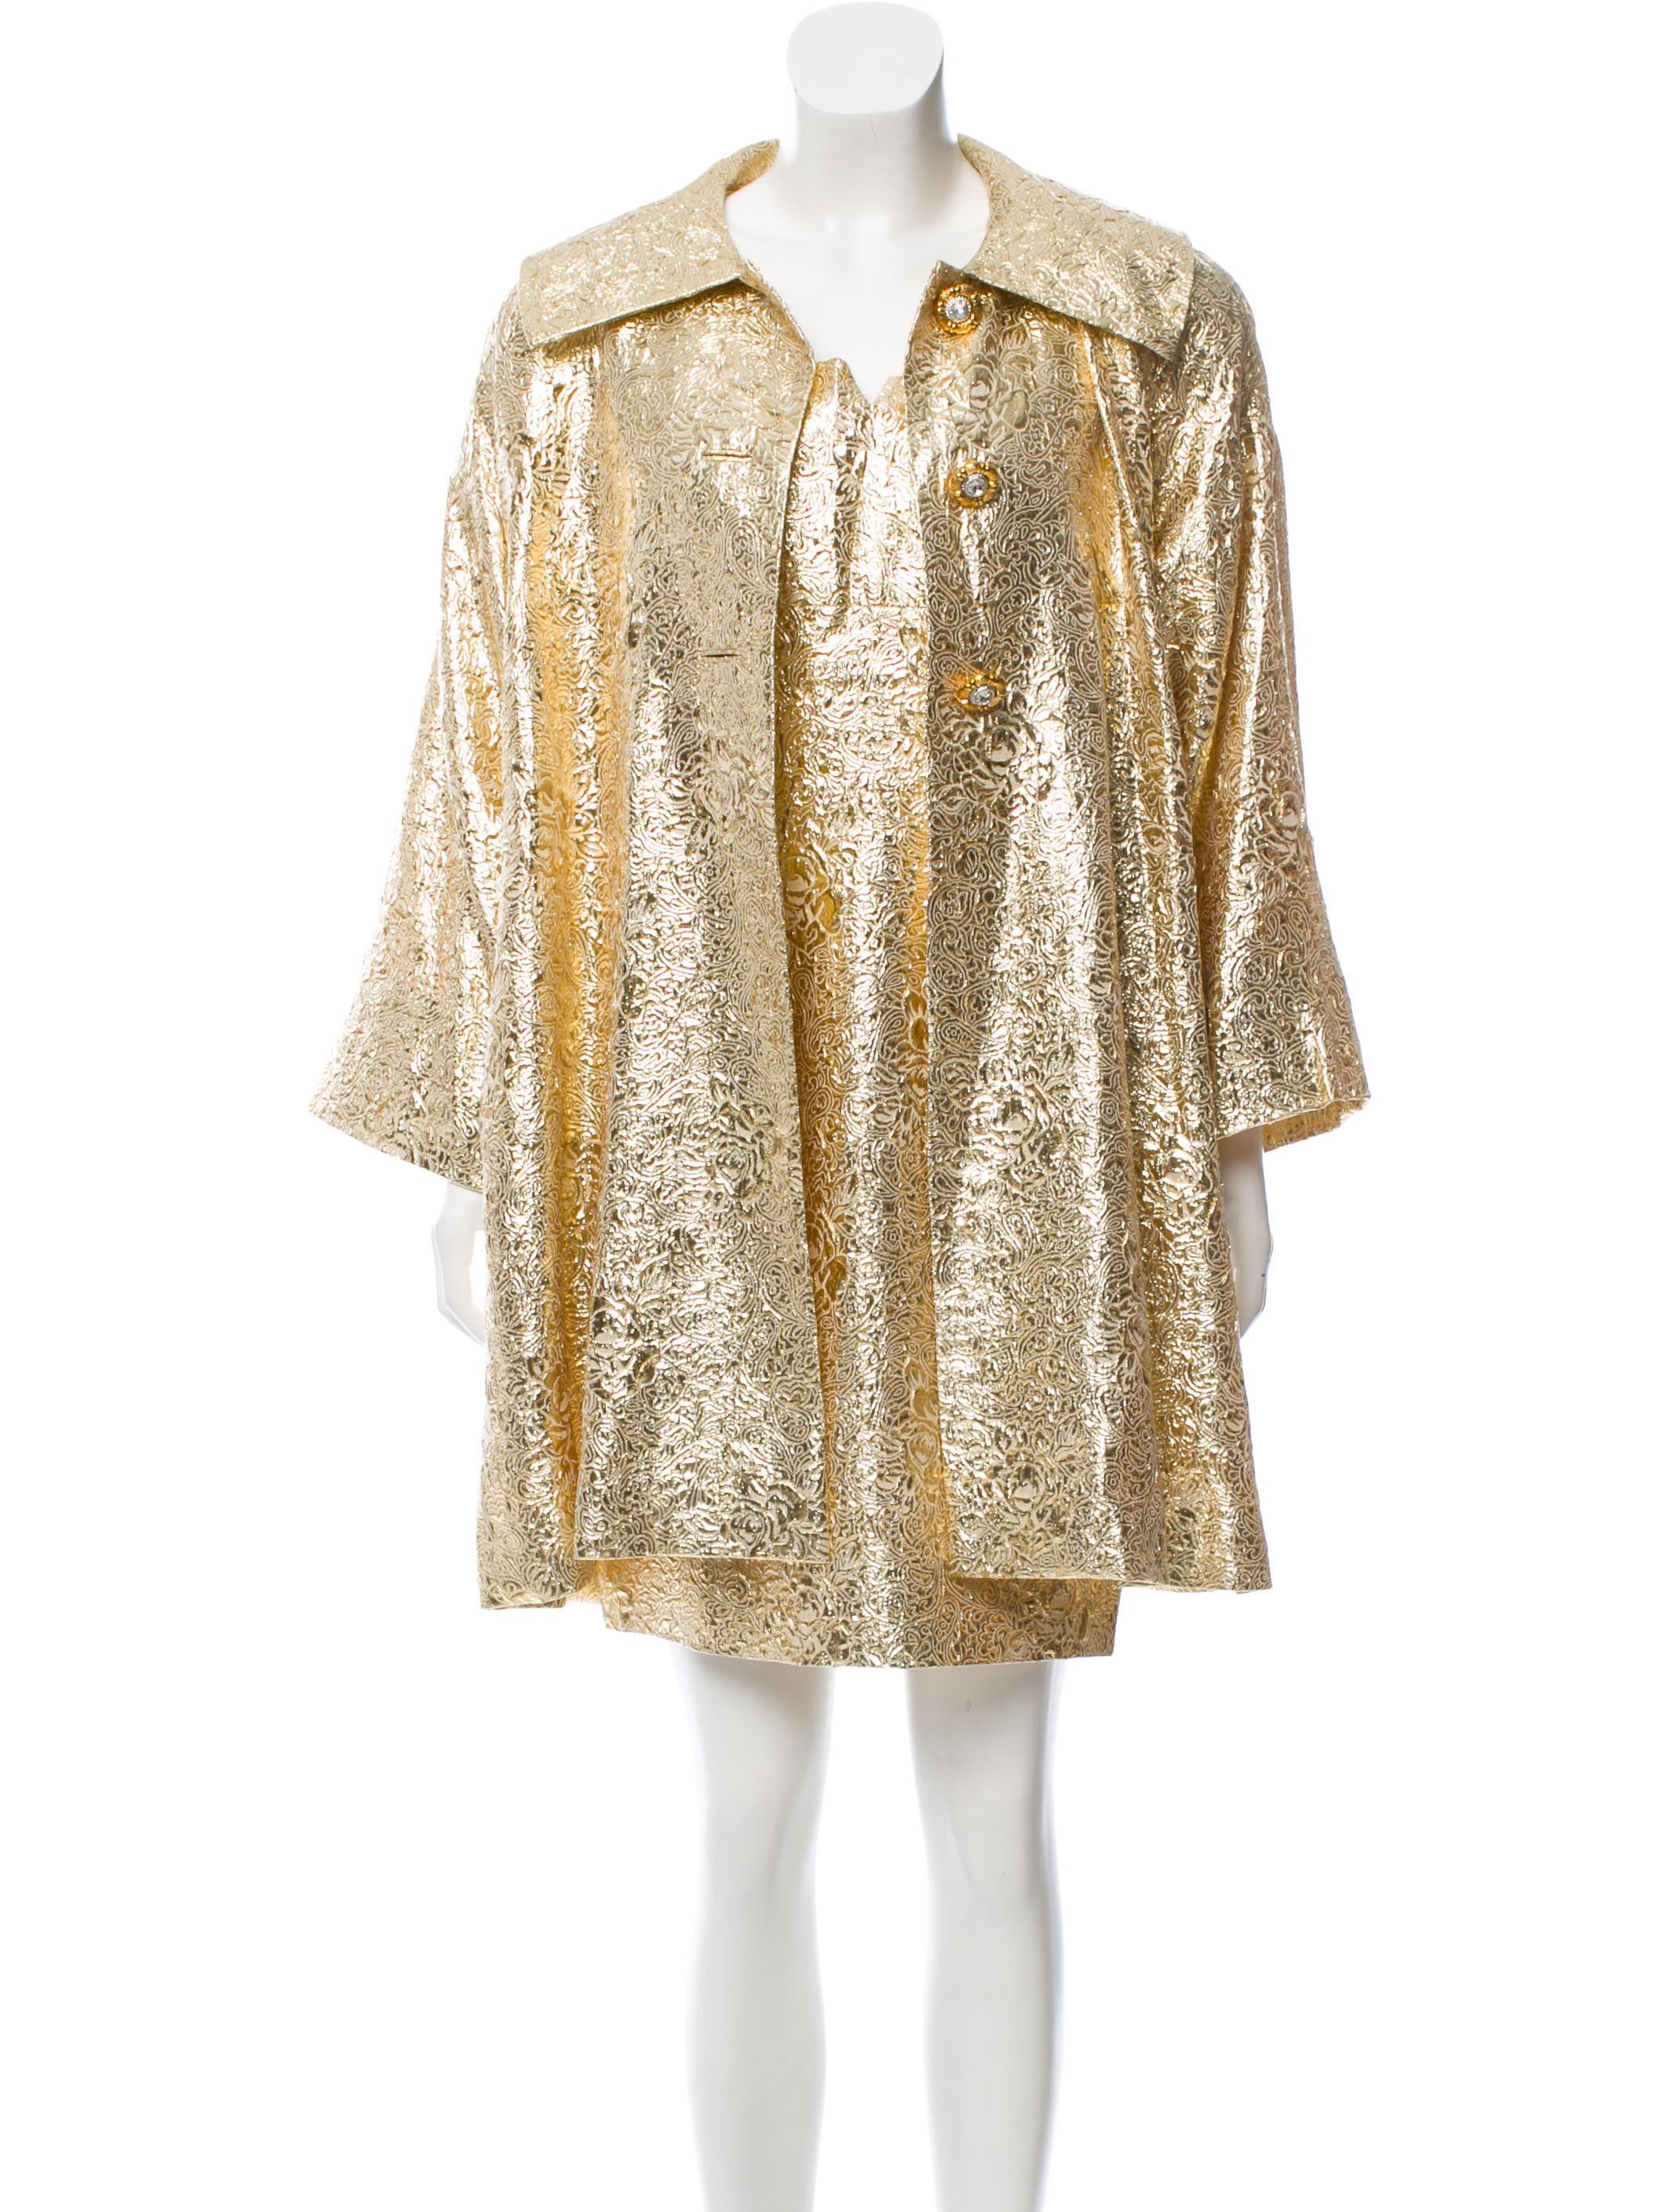 Ricki Freeman X Teri Jon Floral Brocade Dress Suit Clothing